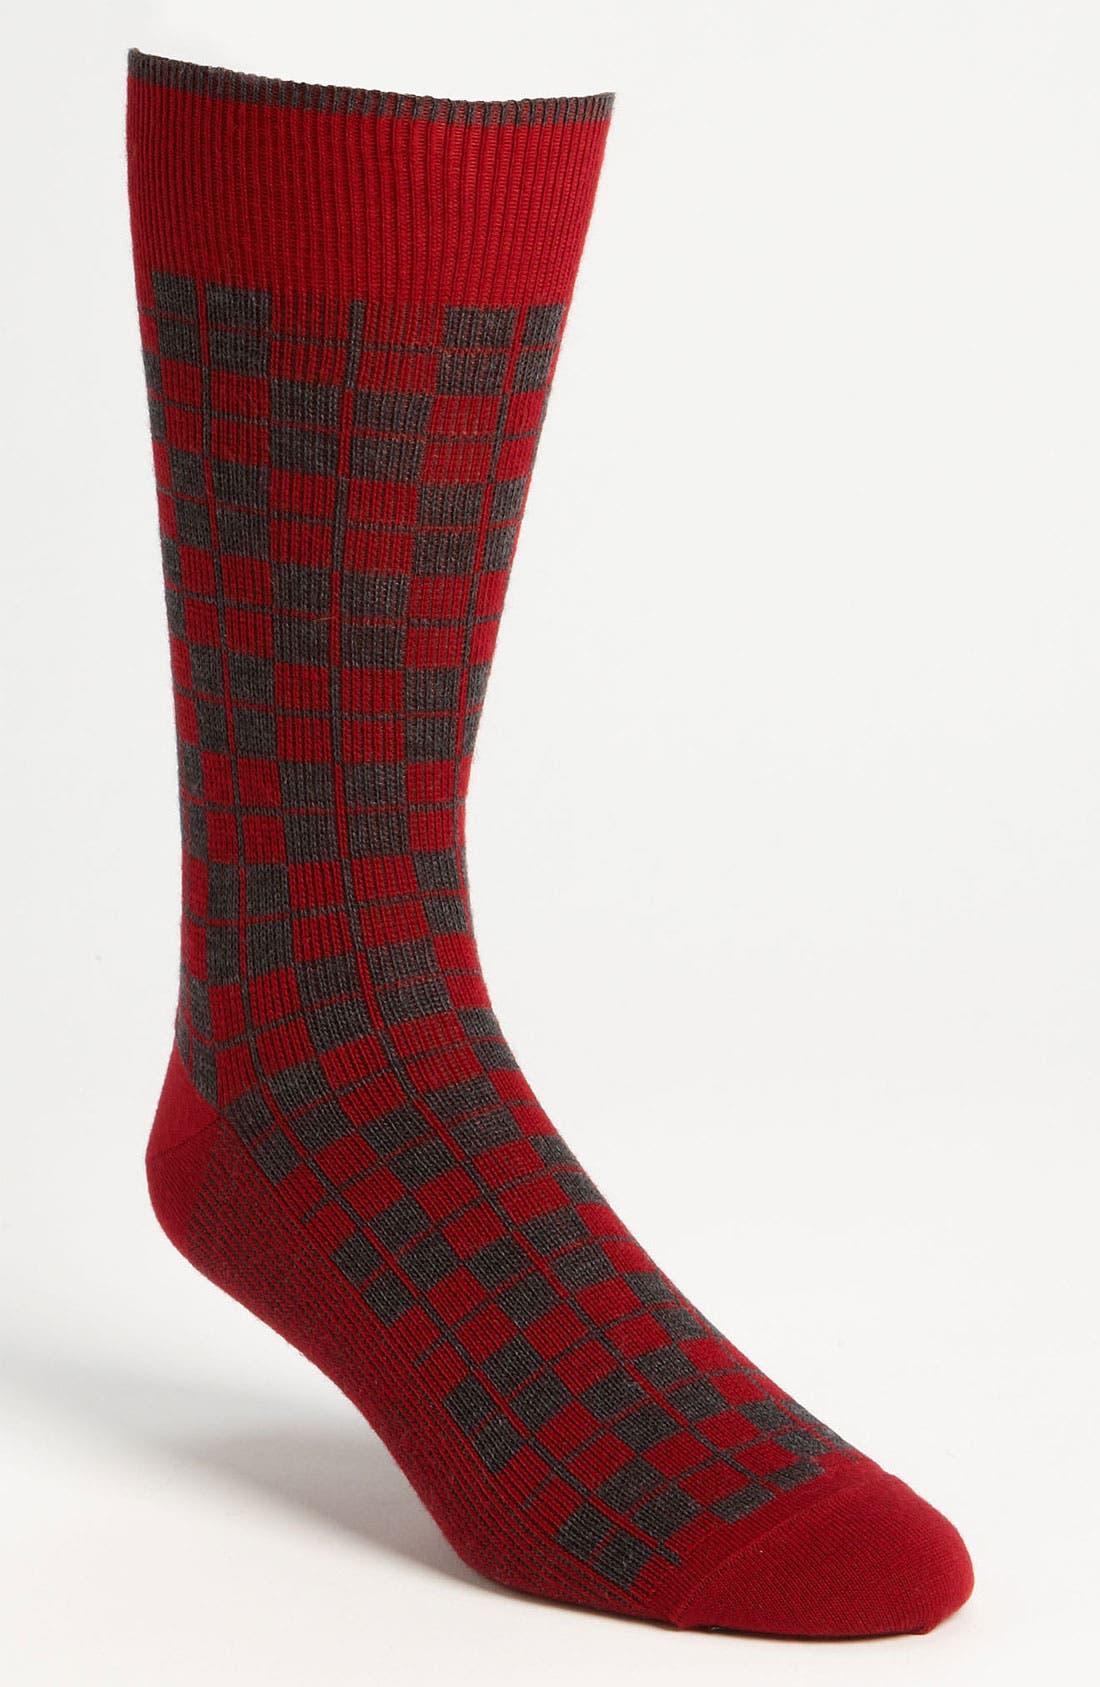 Main Image - Marcoliani 'Jacquard' Tartan Socks